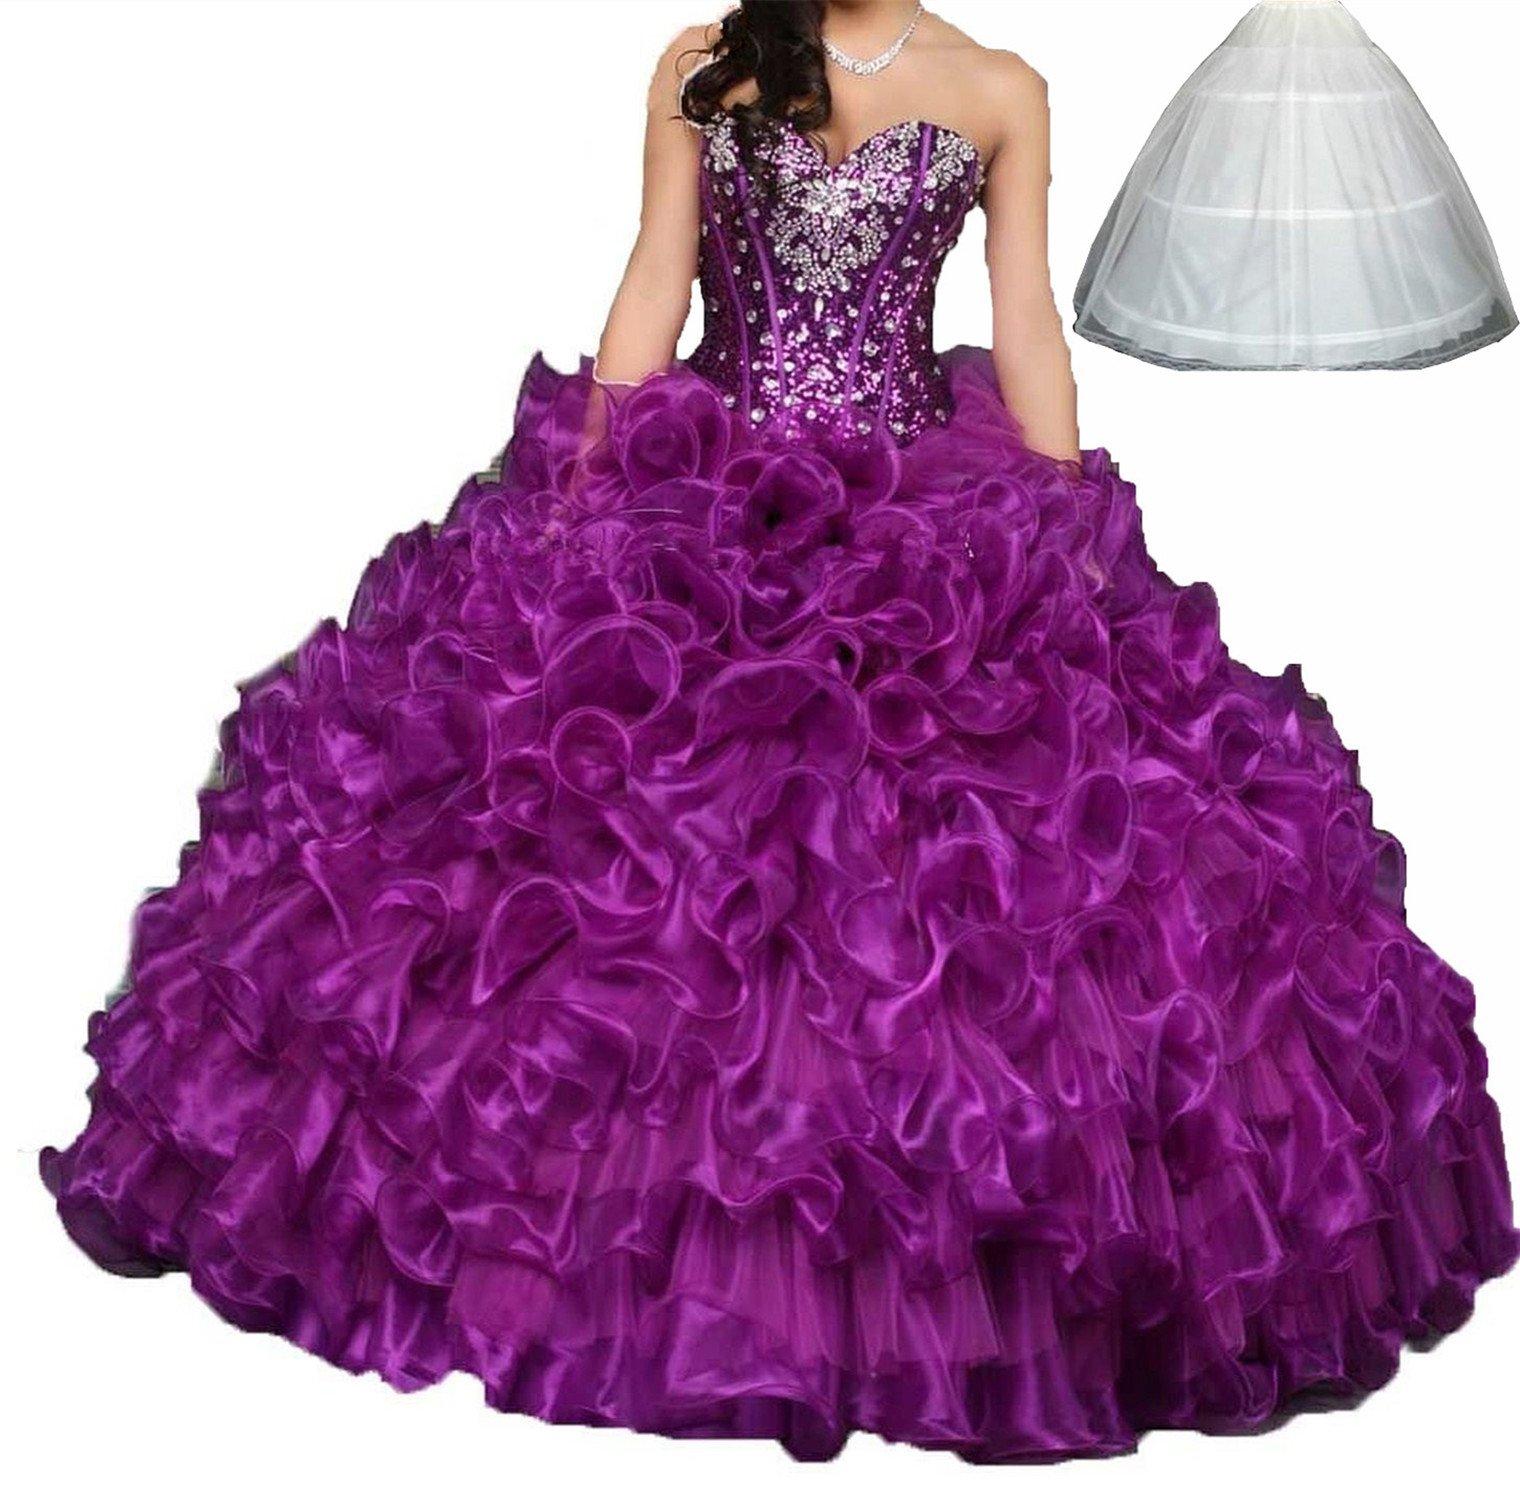 Purple Quinceanera Dresses: Amazon.com